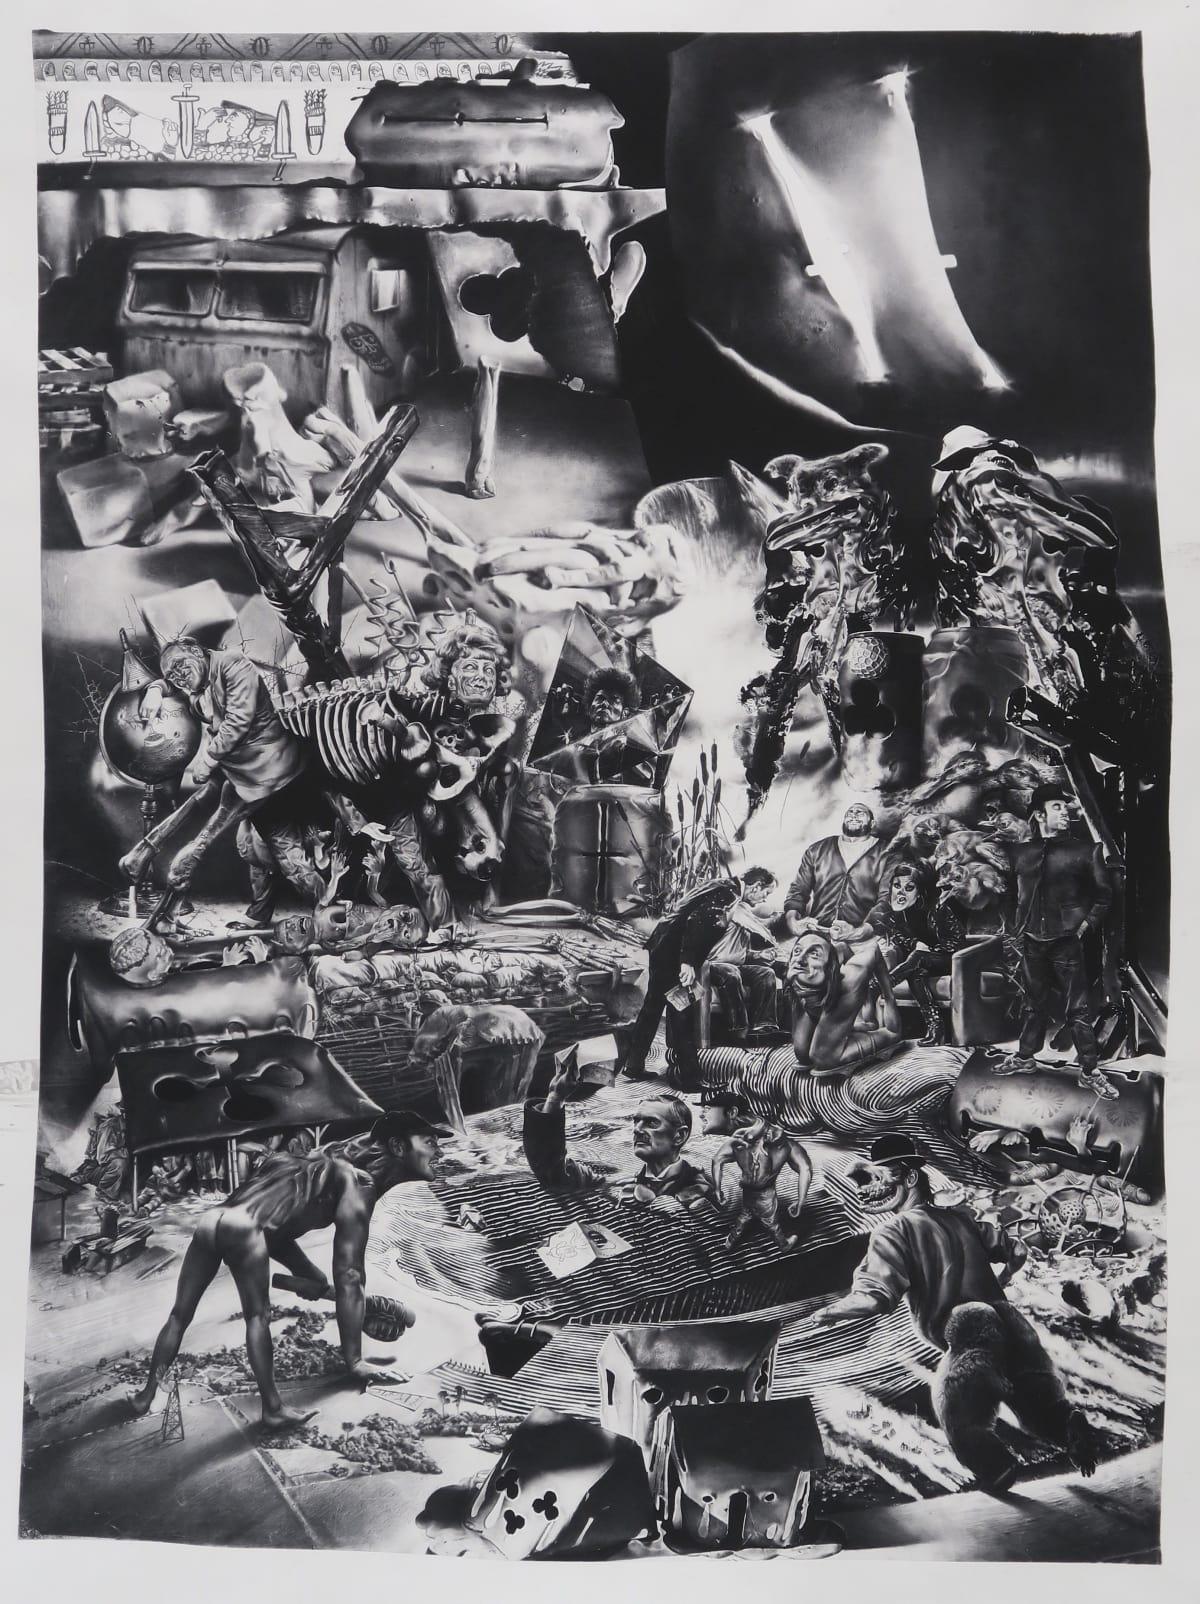 Robert McNally  2016 Ännus Horribilis, 2017  Photogravure on Hahnemühle paper  92.5 x 71.3 cm  36 3/8 x 28 1/8 in  Framed  Edition of 12, #1/12